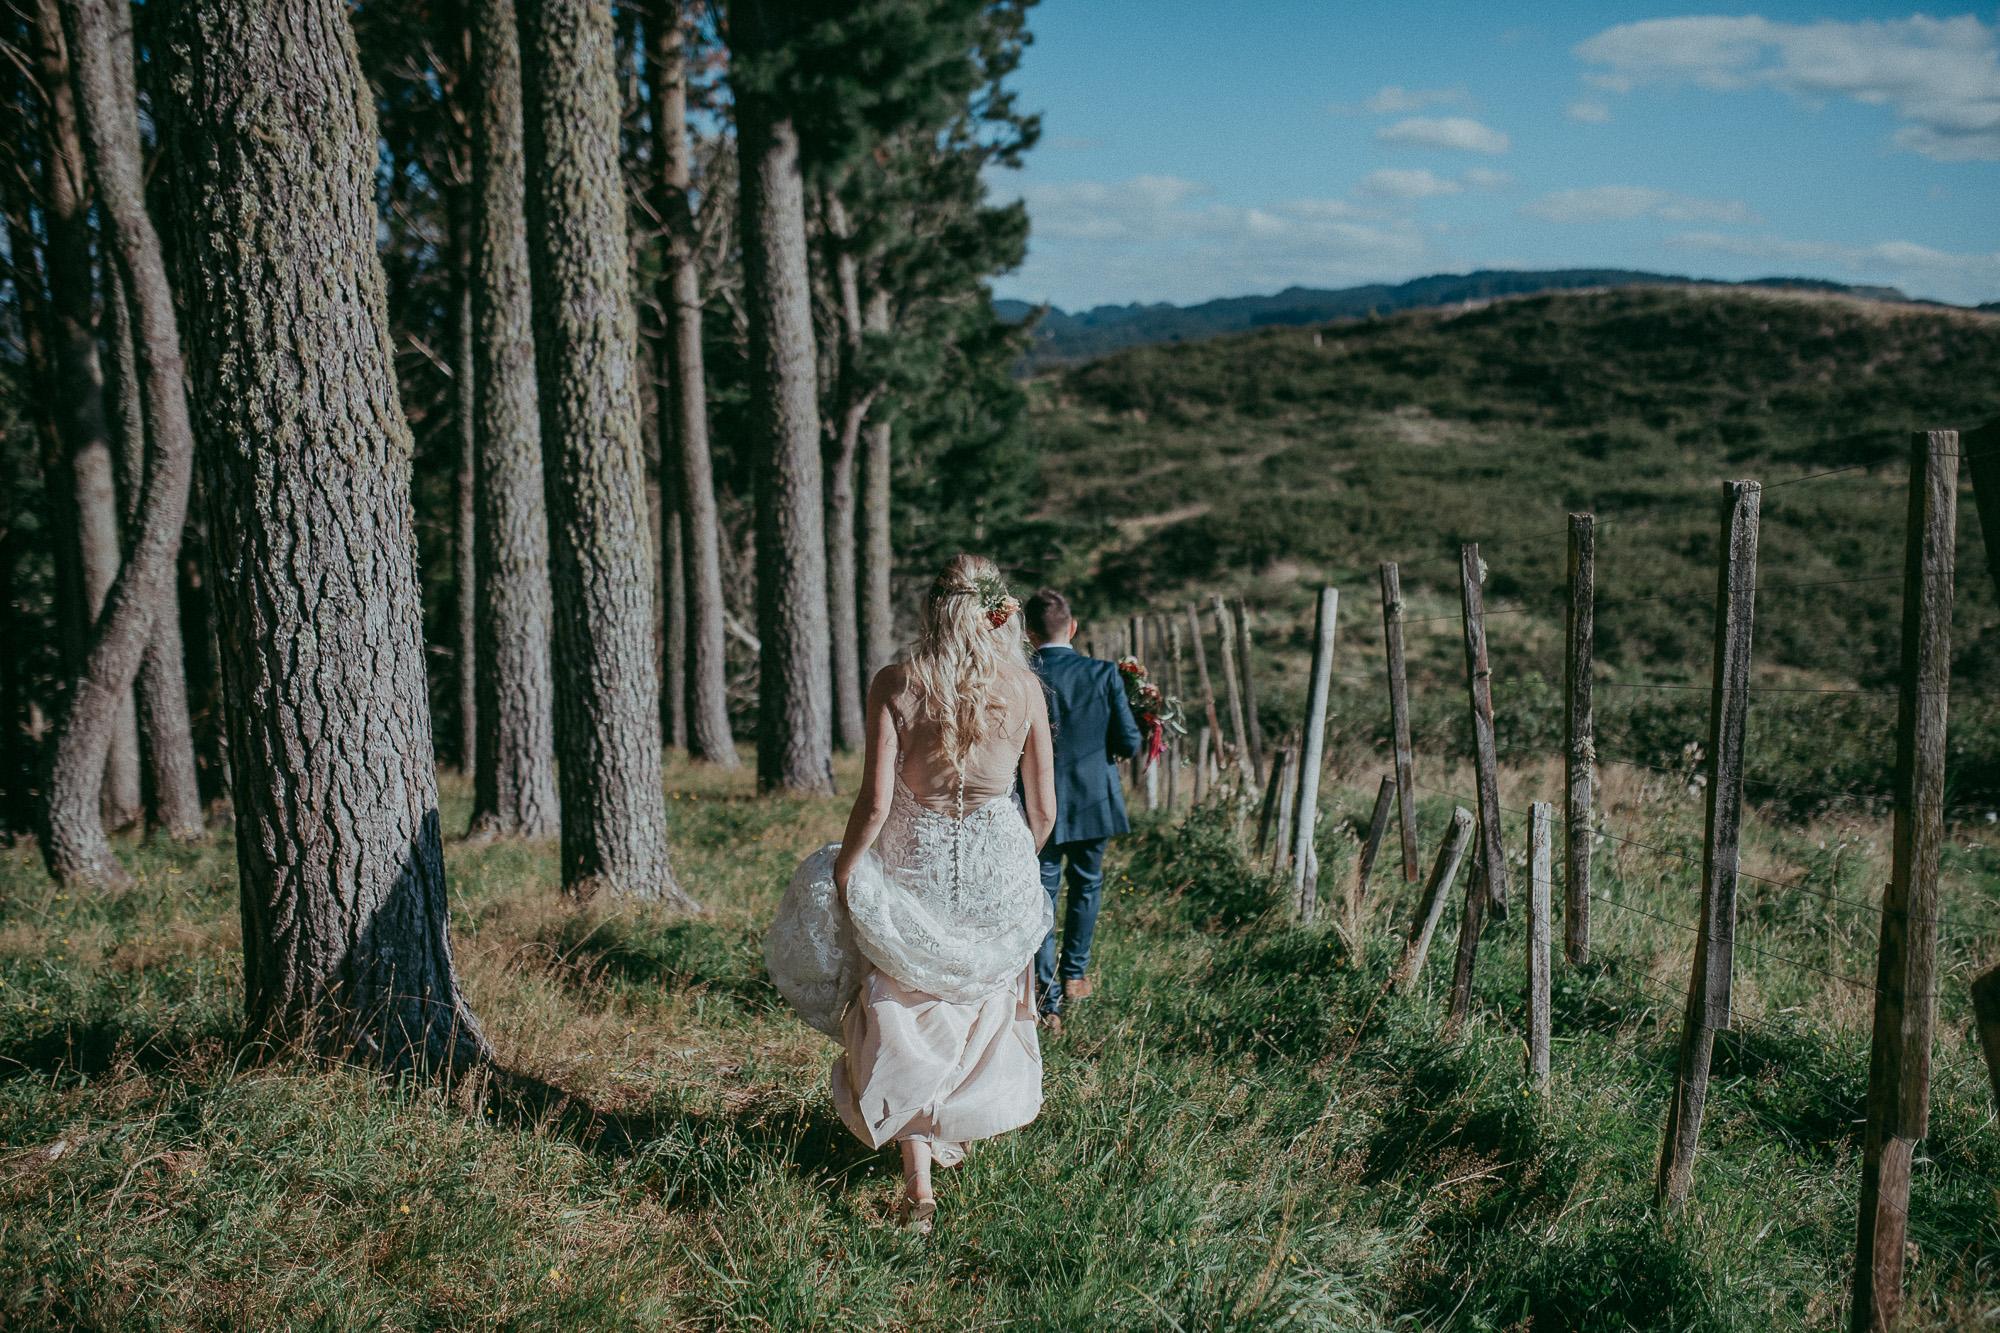 wedding-by-levien-581.JPG